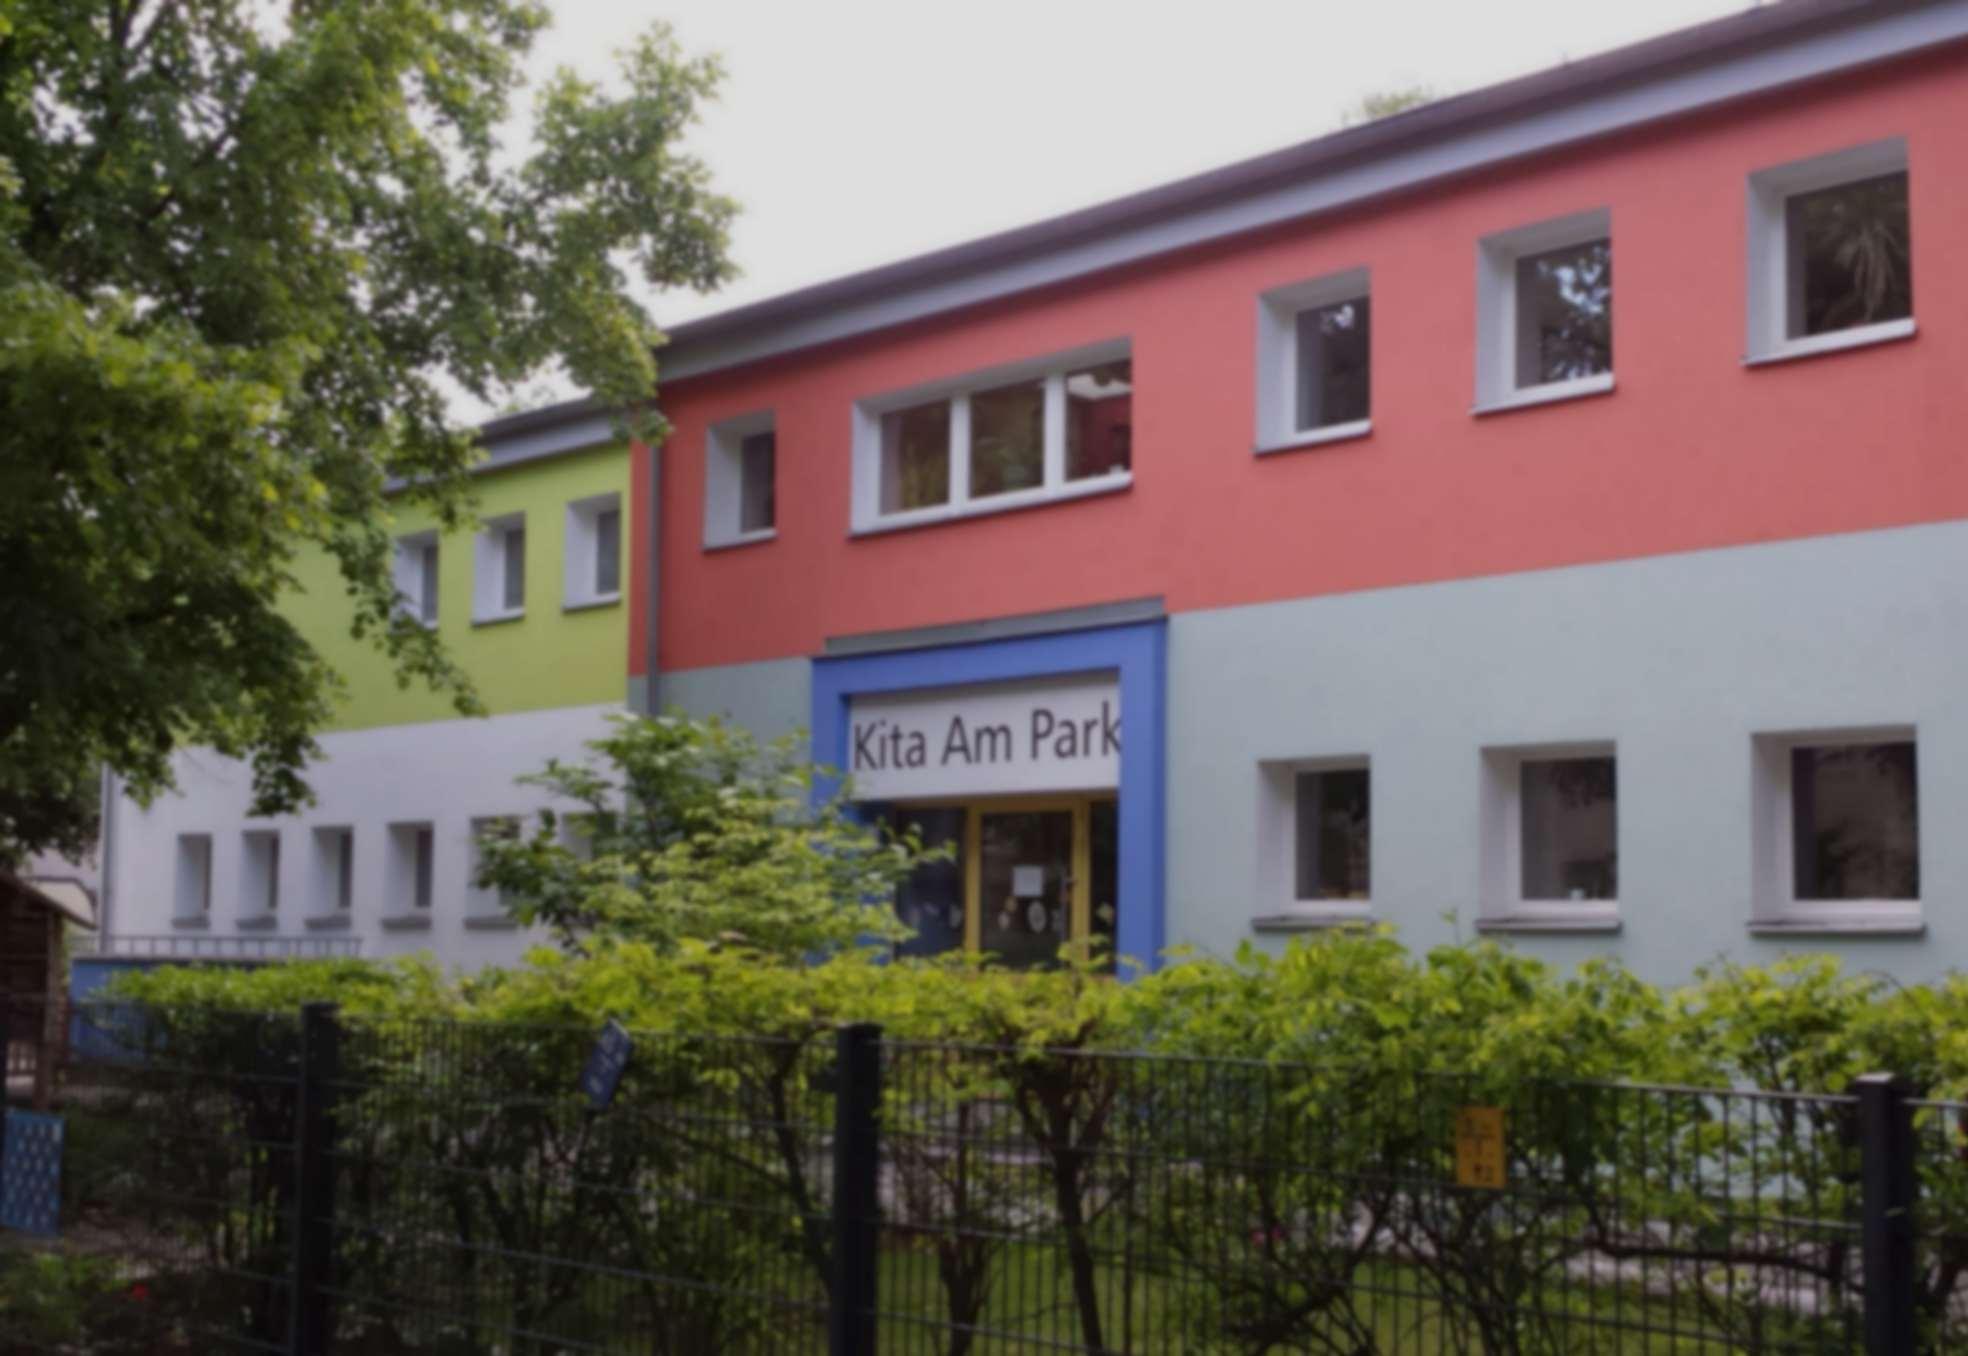 hortantrag berlin hellersdorf